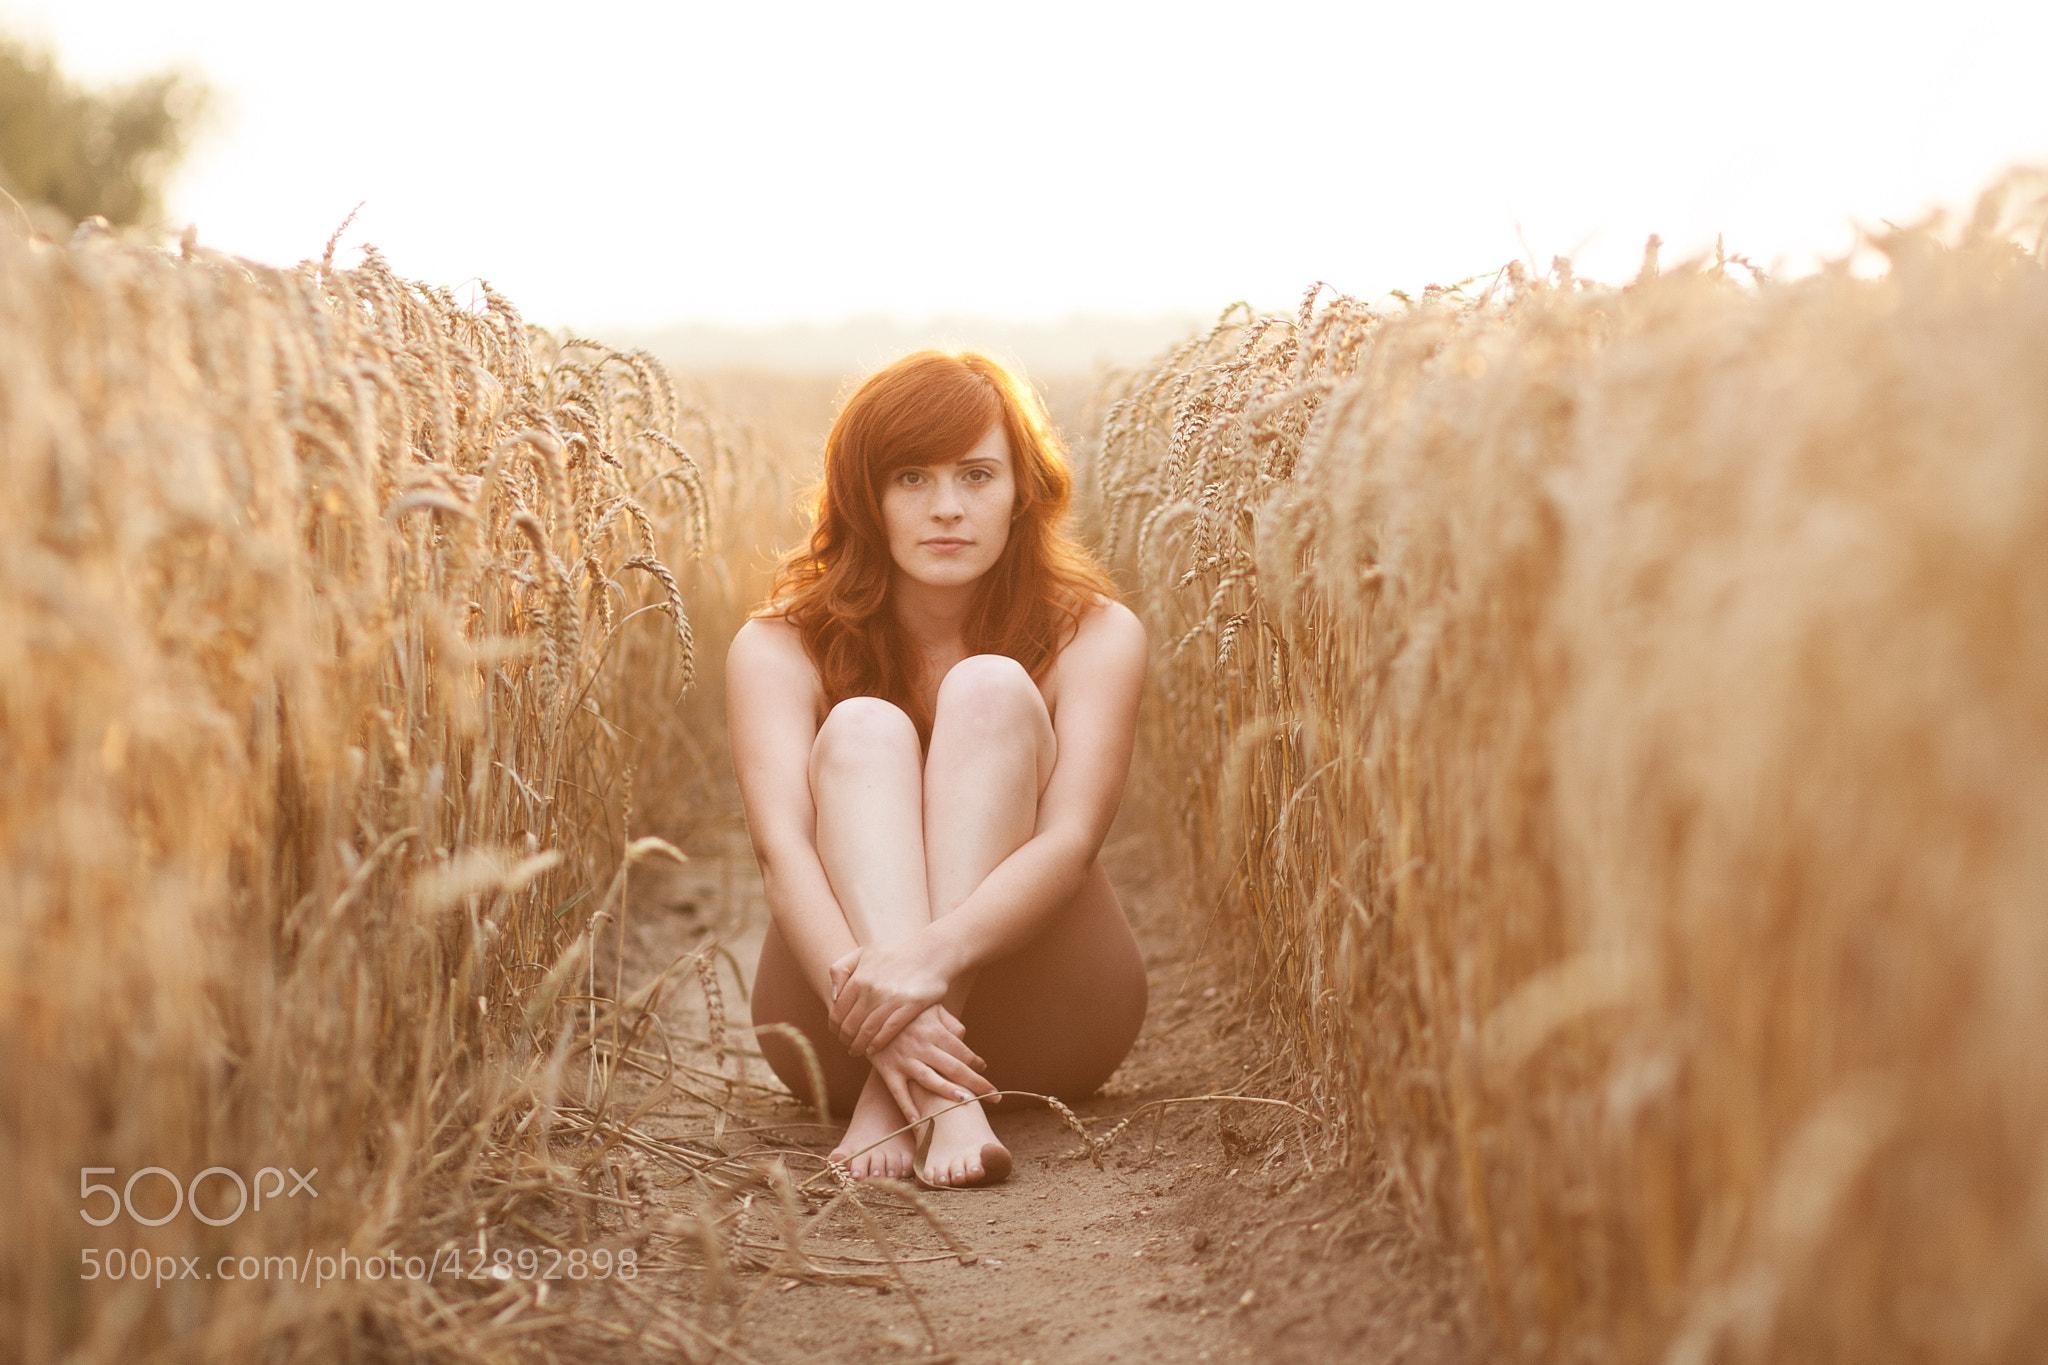 Photograph *** by Patrick Schanz on 500px